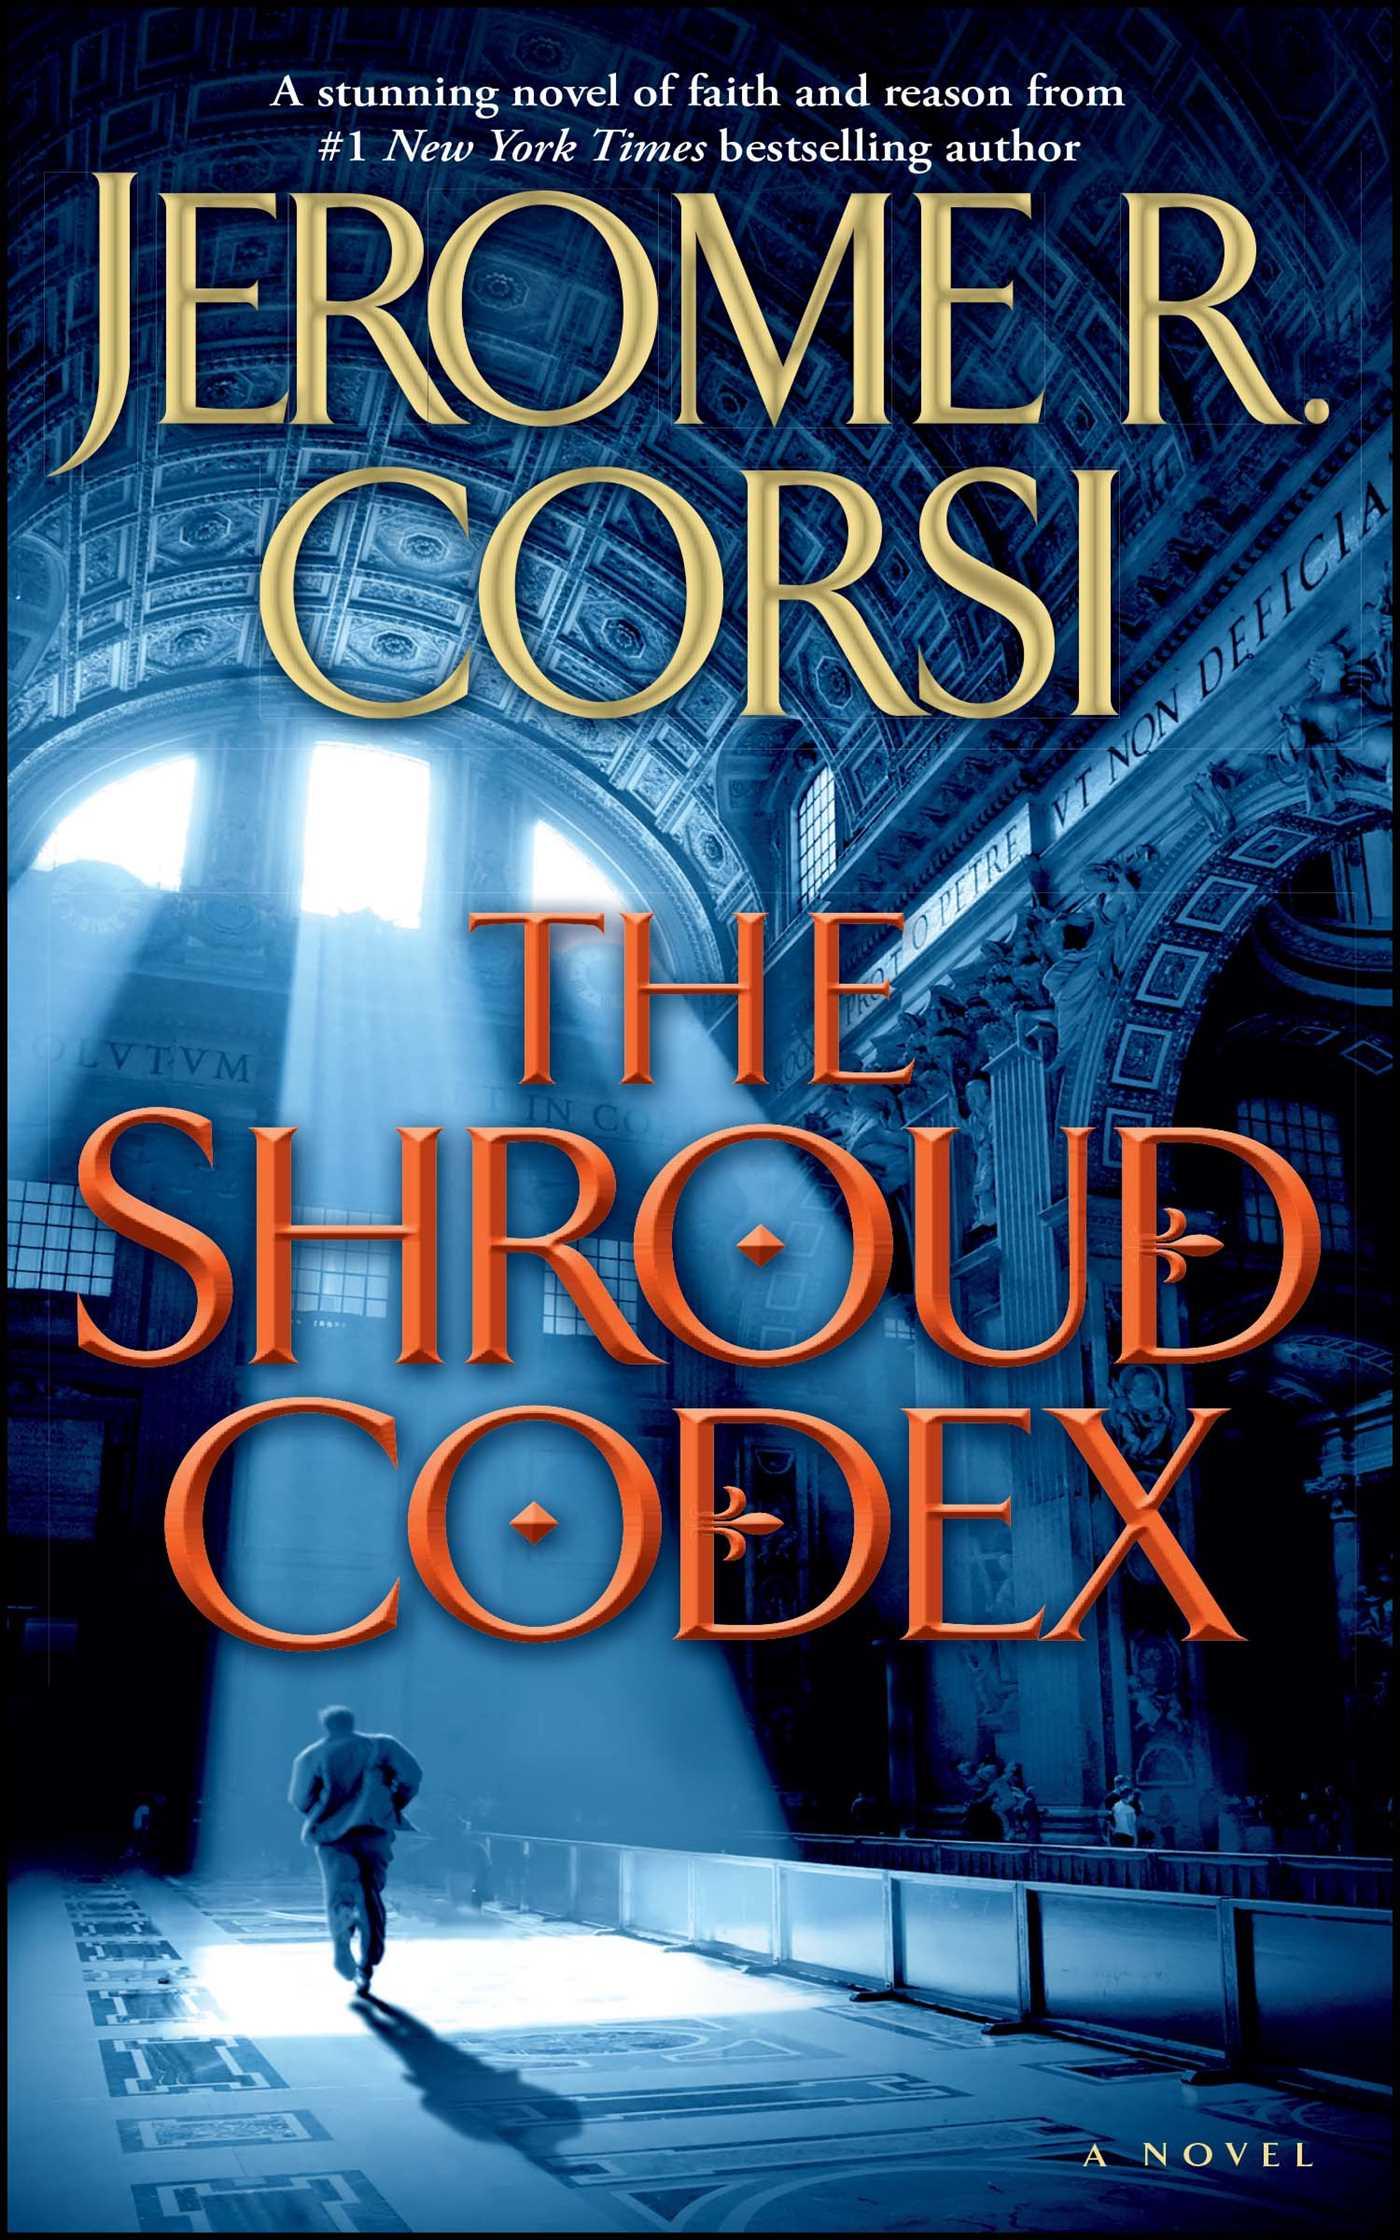 The shroud codex 9781439190456 hr